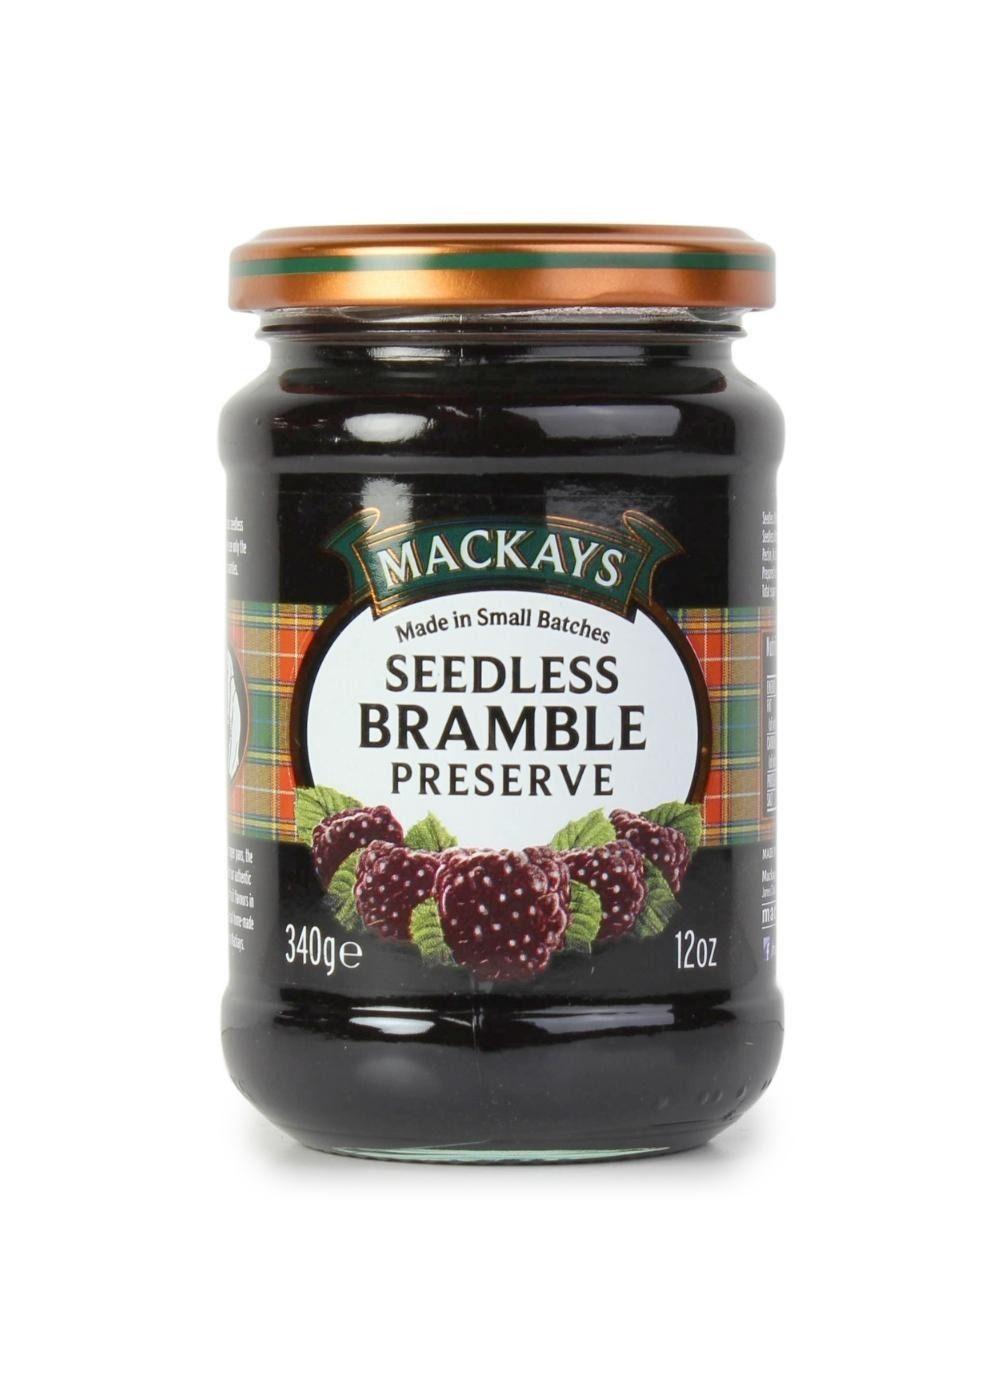 Seedless Bramble Preserve